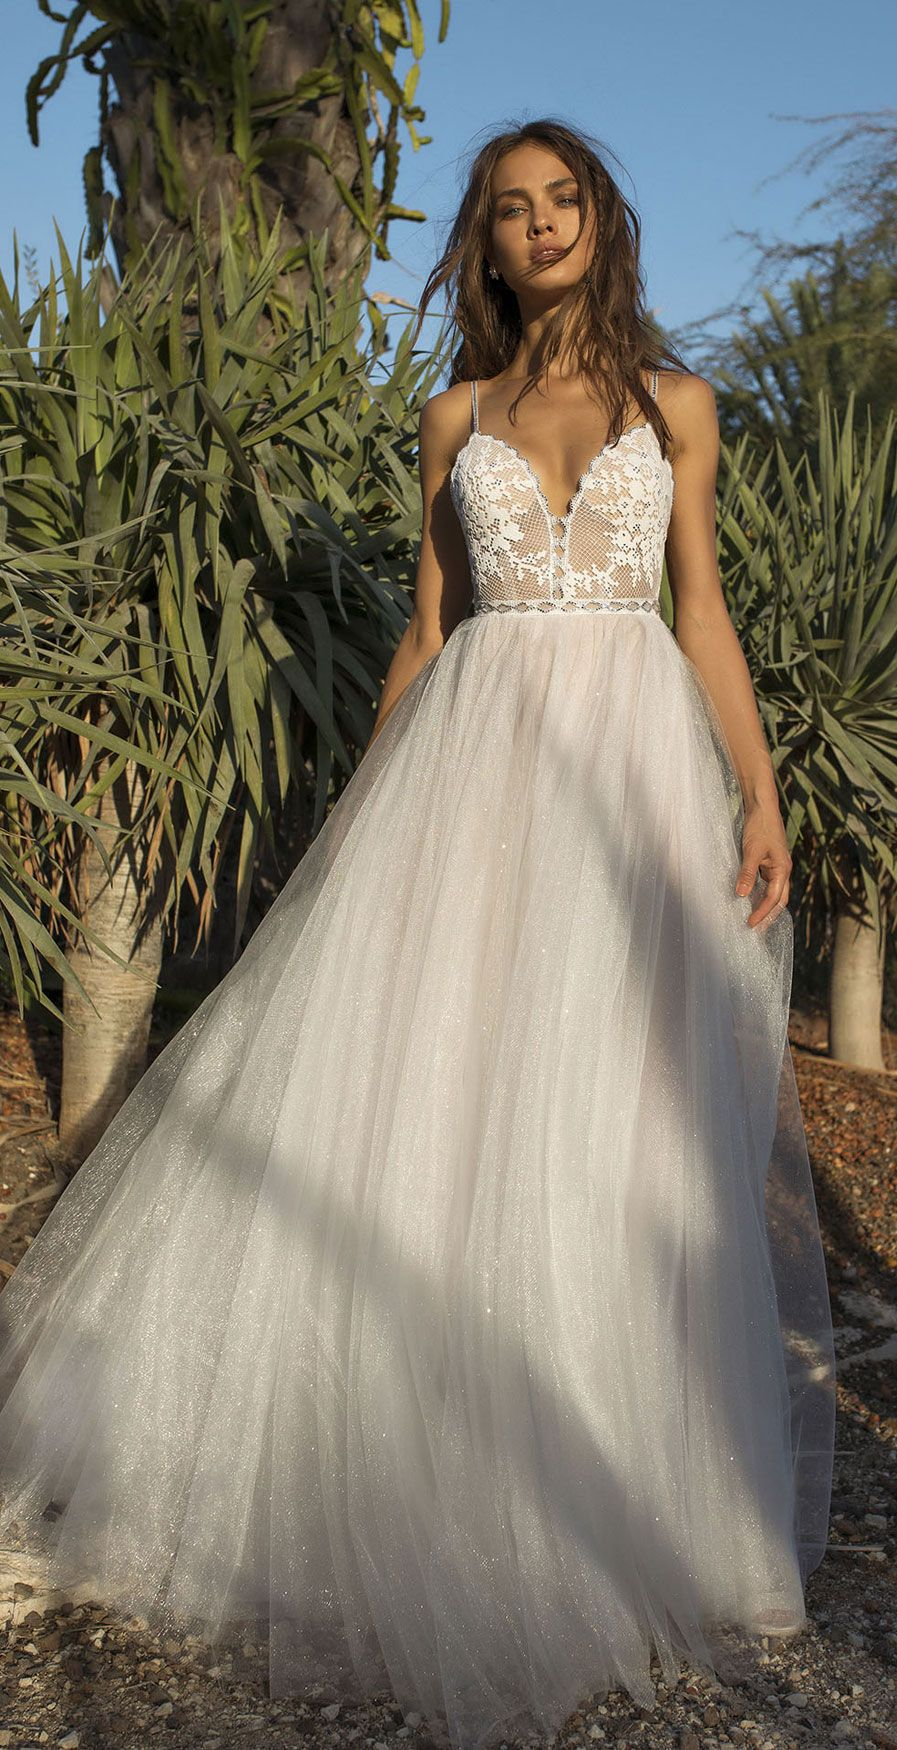 32 Beach Wedding Dresses Perfect For A Destination Wedding, simple wedding dress ,off the shoulder wedding gown #weddingdress #weddinggown